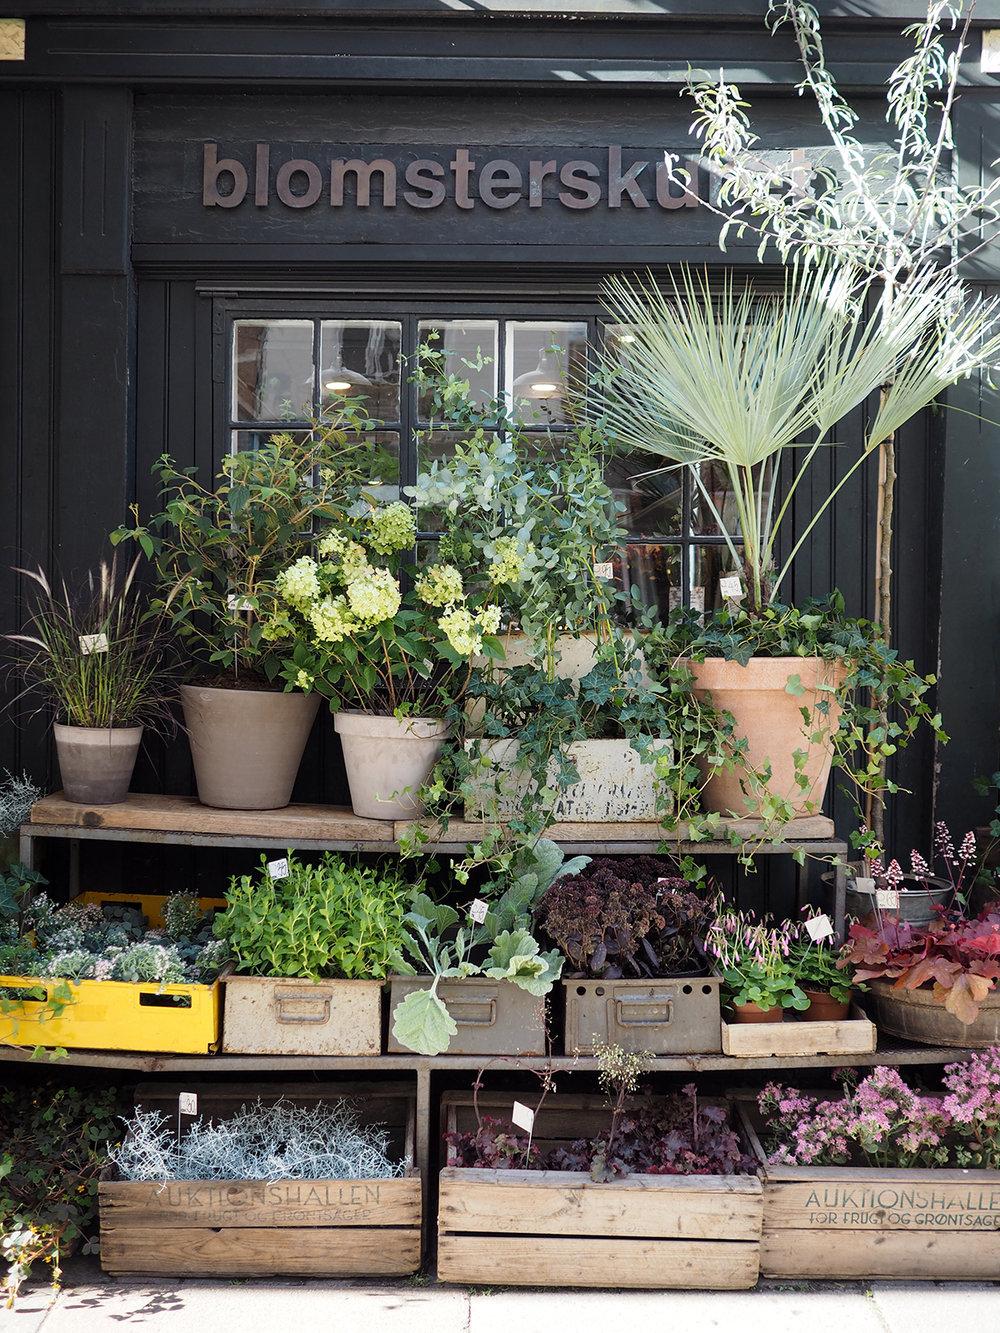 Copenhagen flower shop